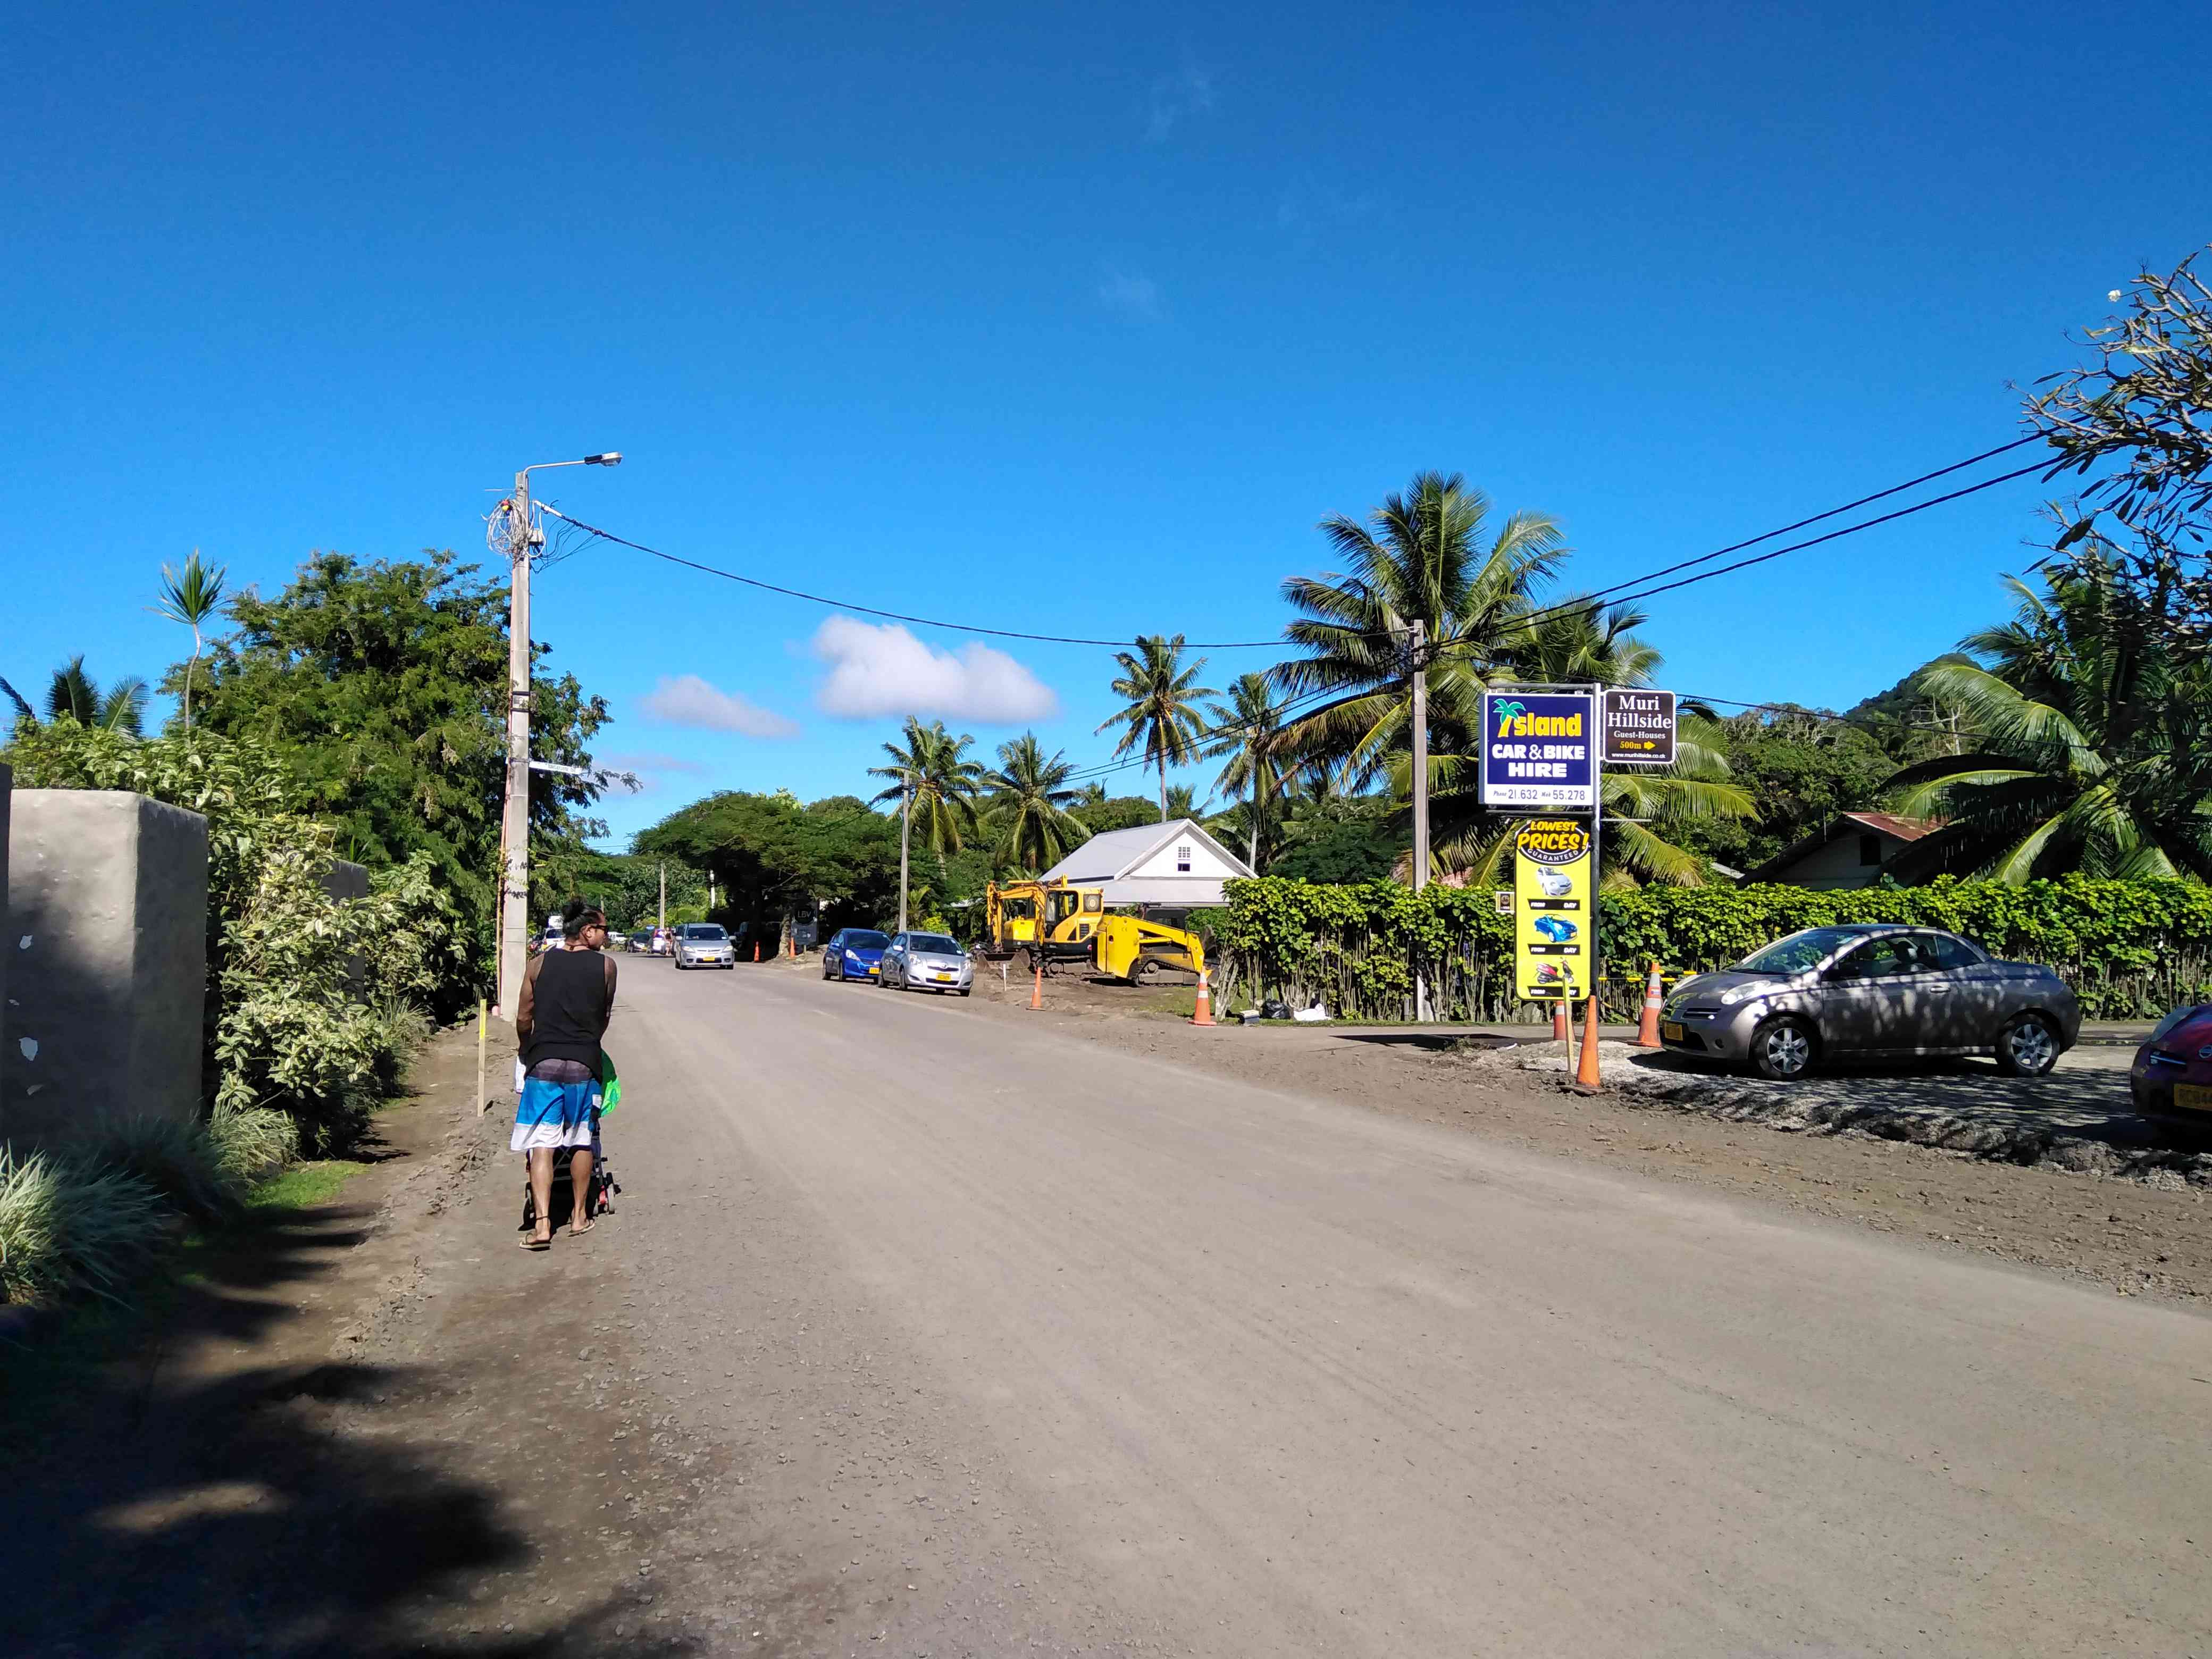 The quiet roads of Rarotonga